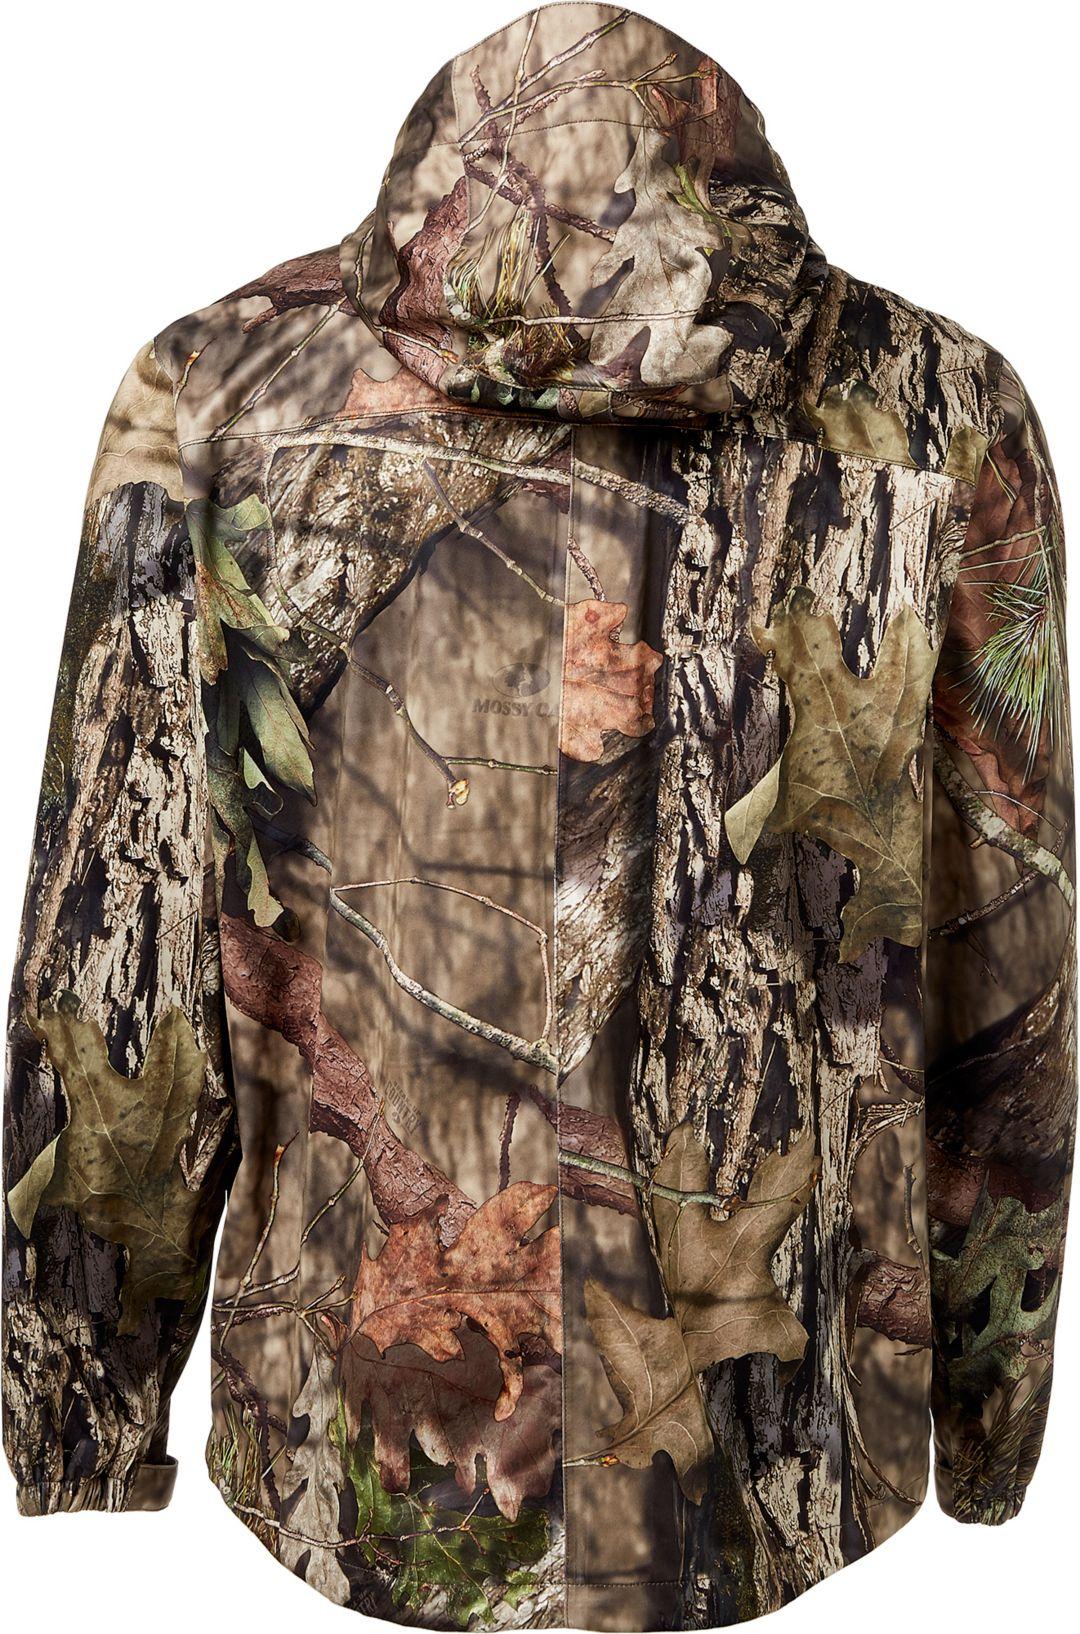 79f8f3c0bb1e5 Field & Stream Every Hunt Packable Rain Jacket | Field & Stream